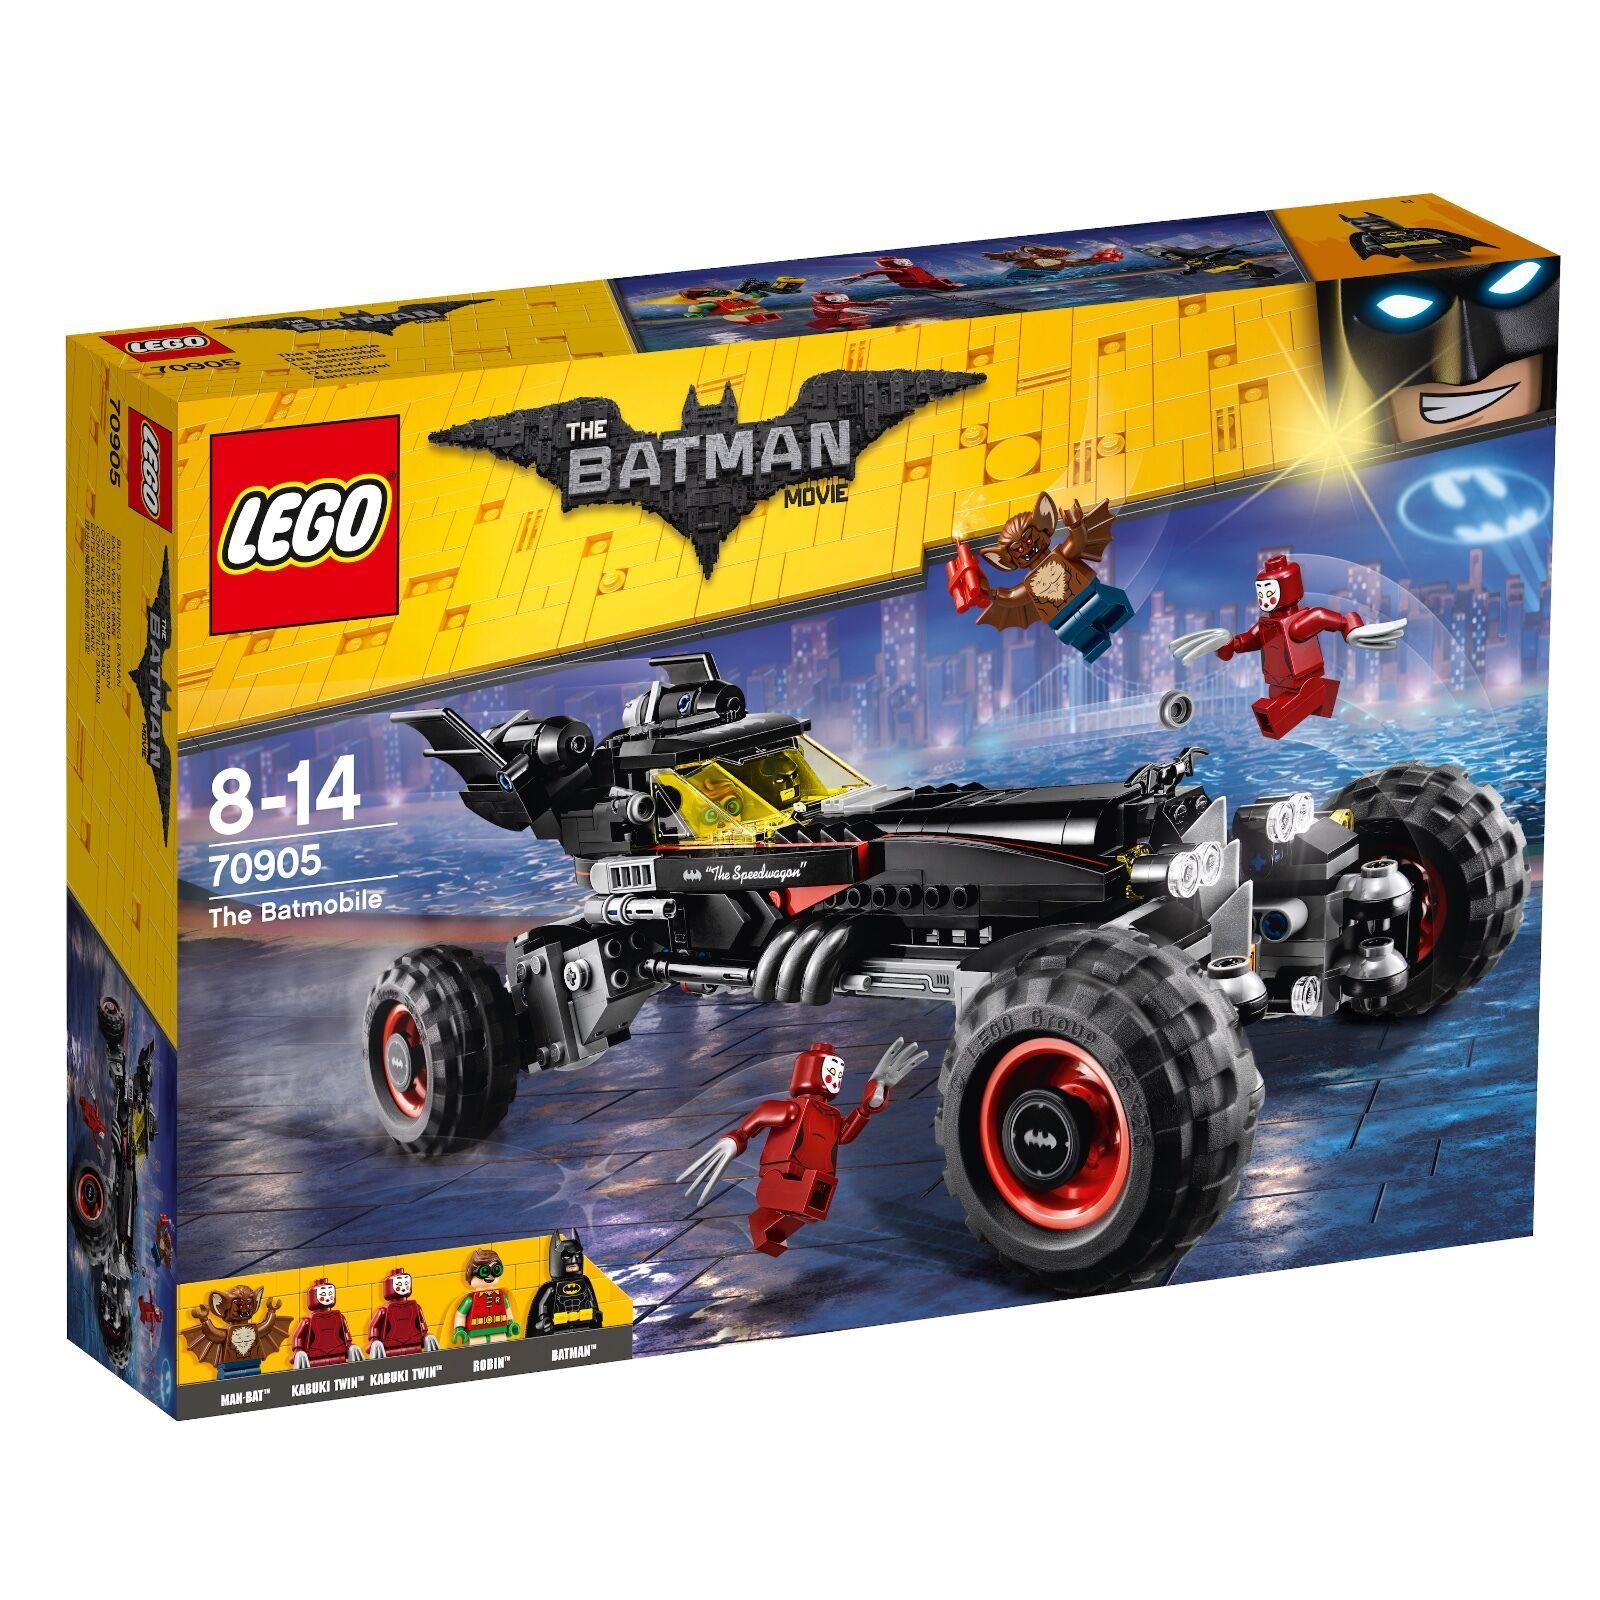 LEGO® THE LEGO® BATMAN MOVIE 70905 Das Batmobil NEU OVP_ The Batmobile NEW MISB